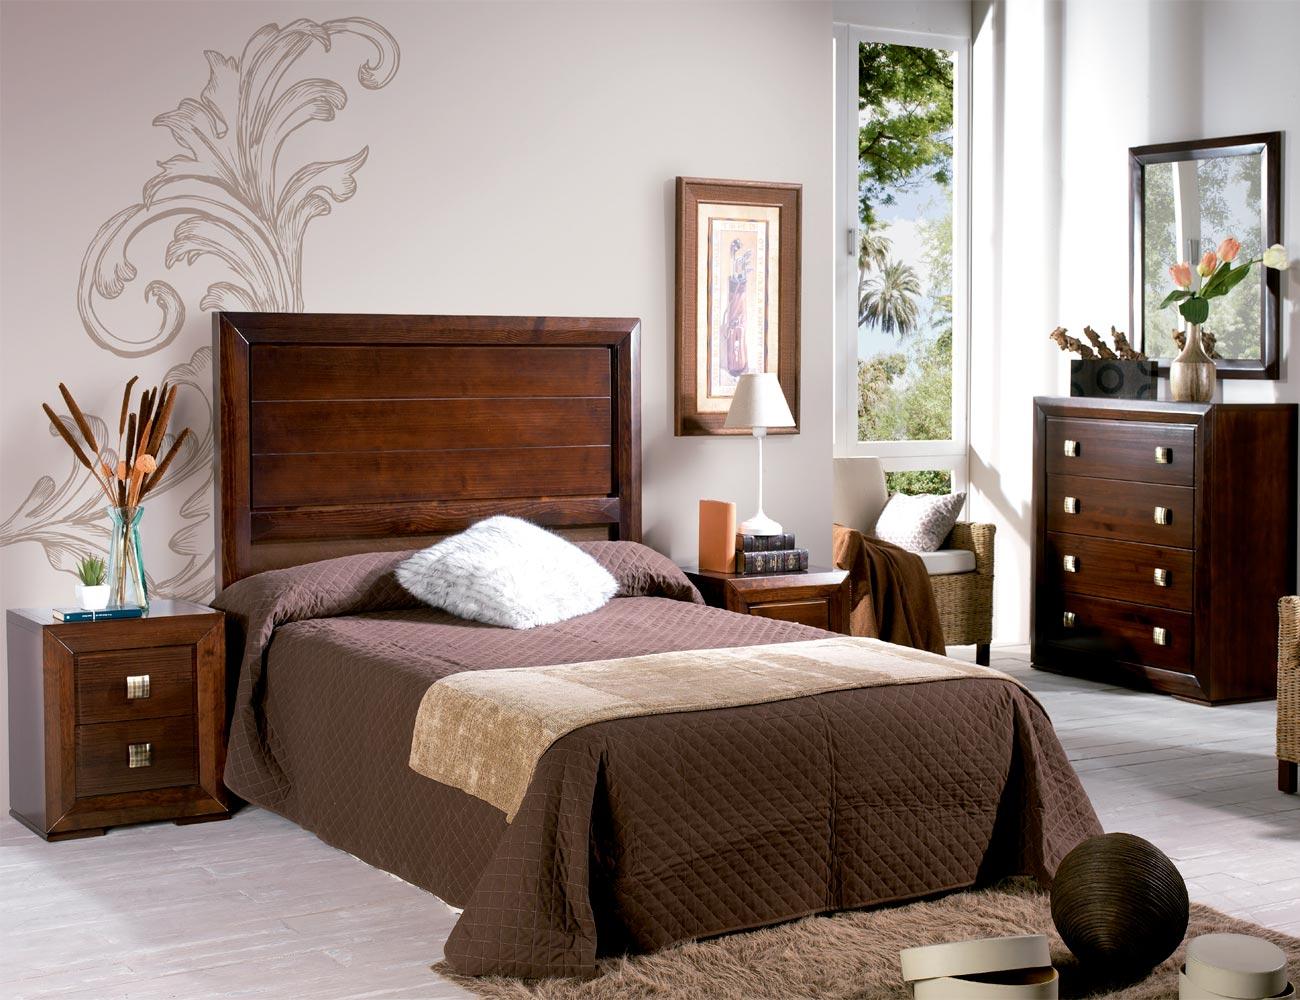 Composicion26 dormitorio matrimonio cabecero madera